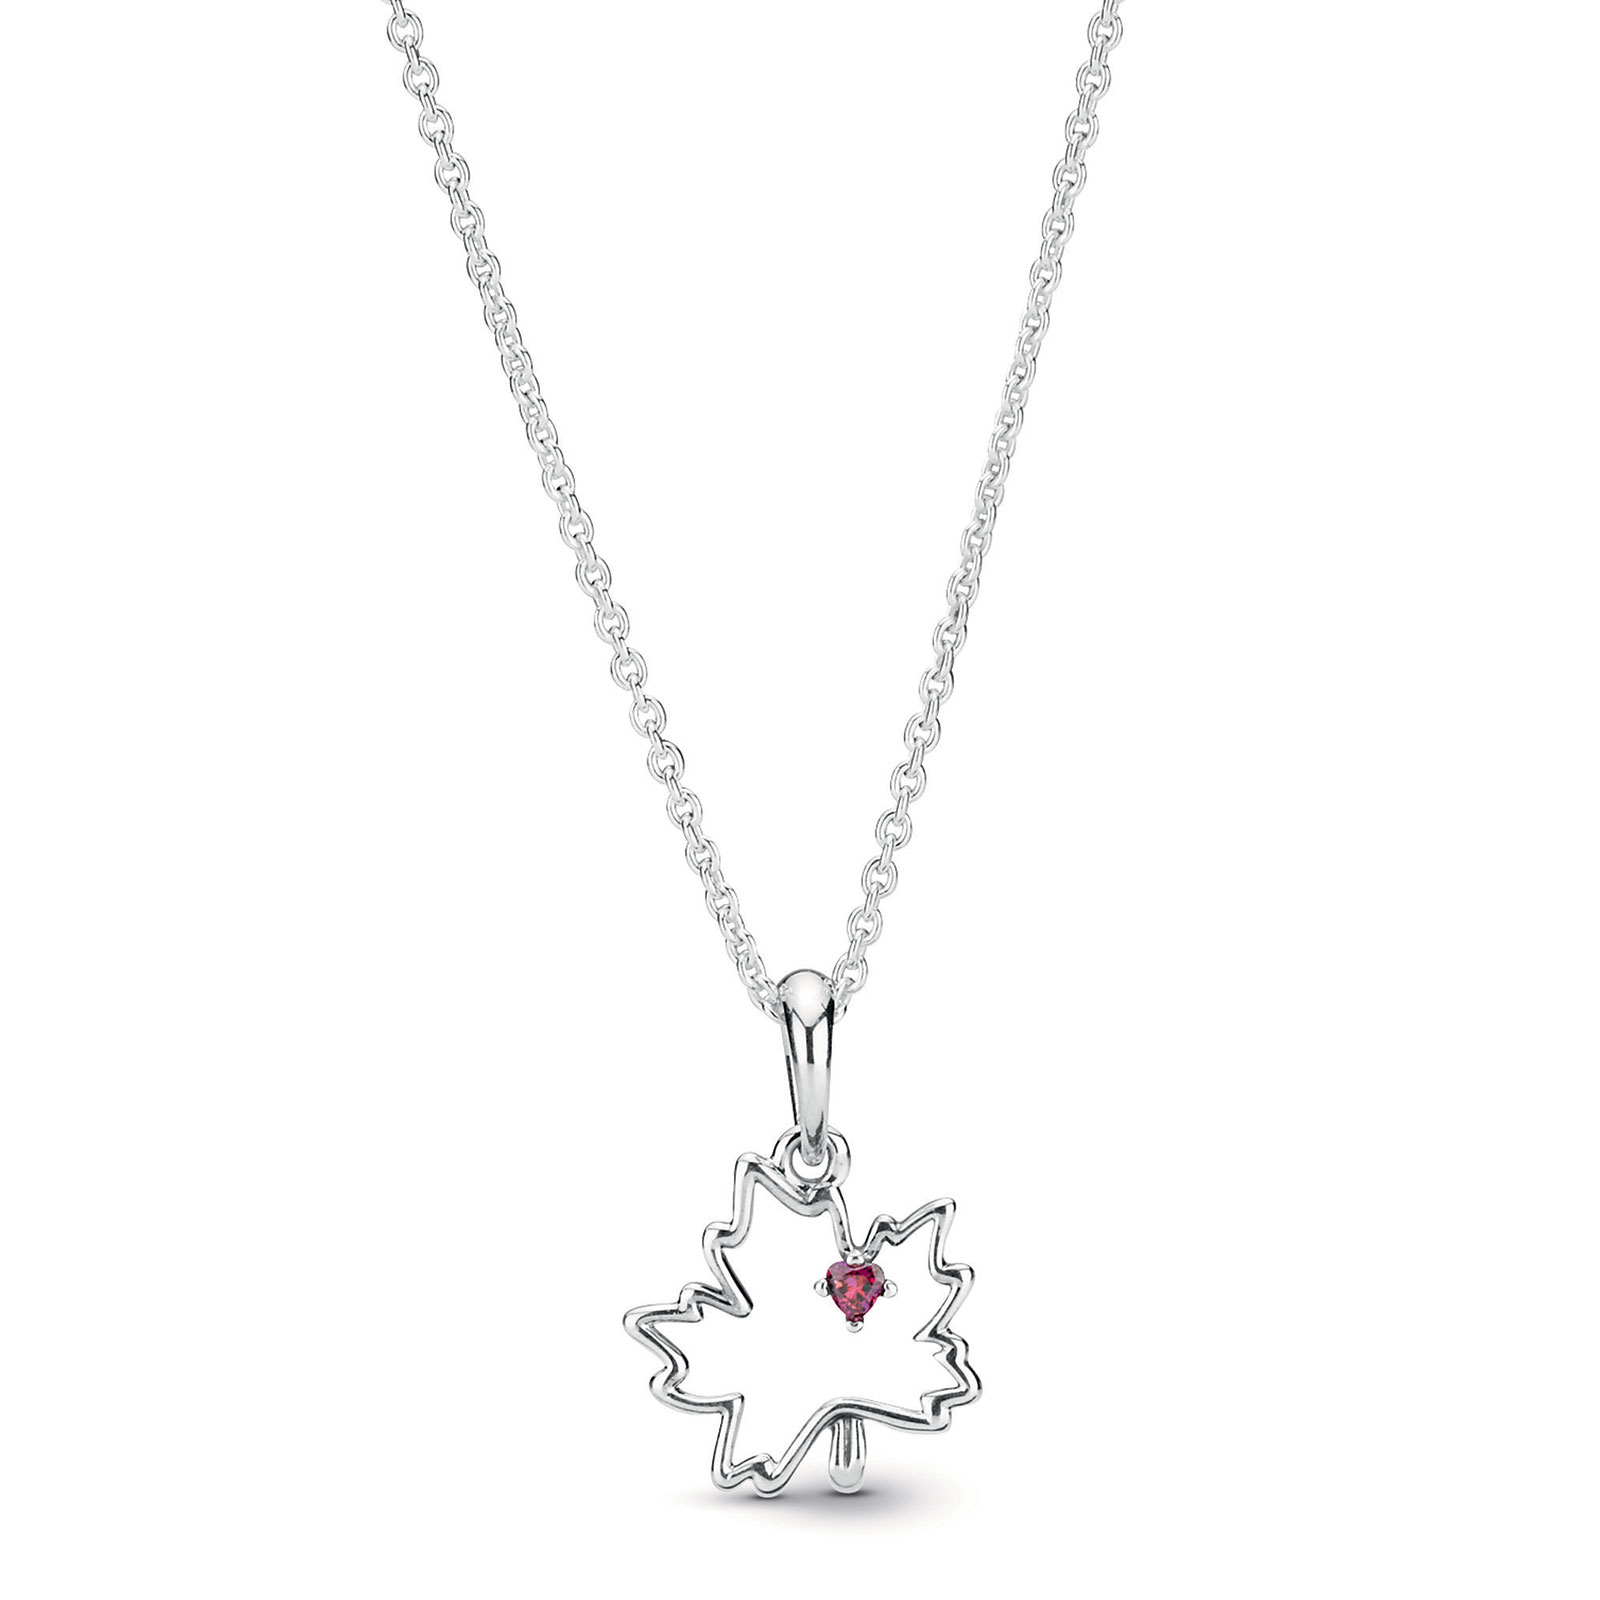 Pandora Symbol Of Canada Necklace Precious Accents Ltd